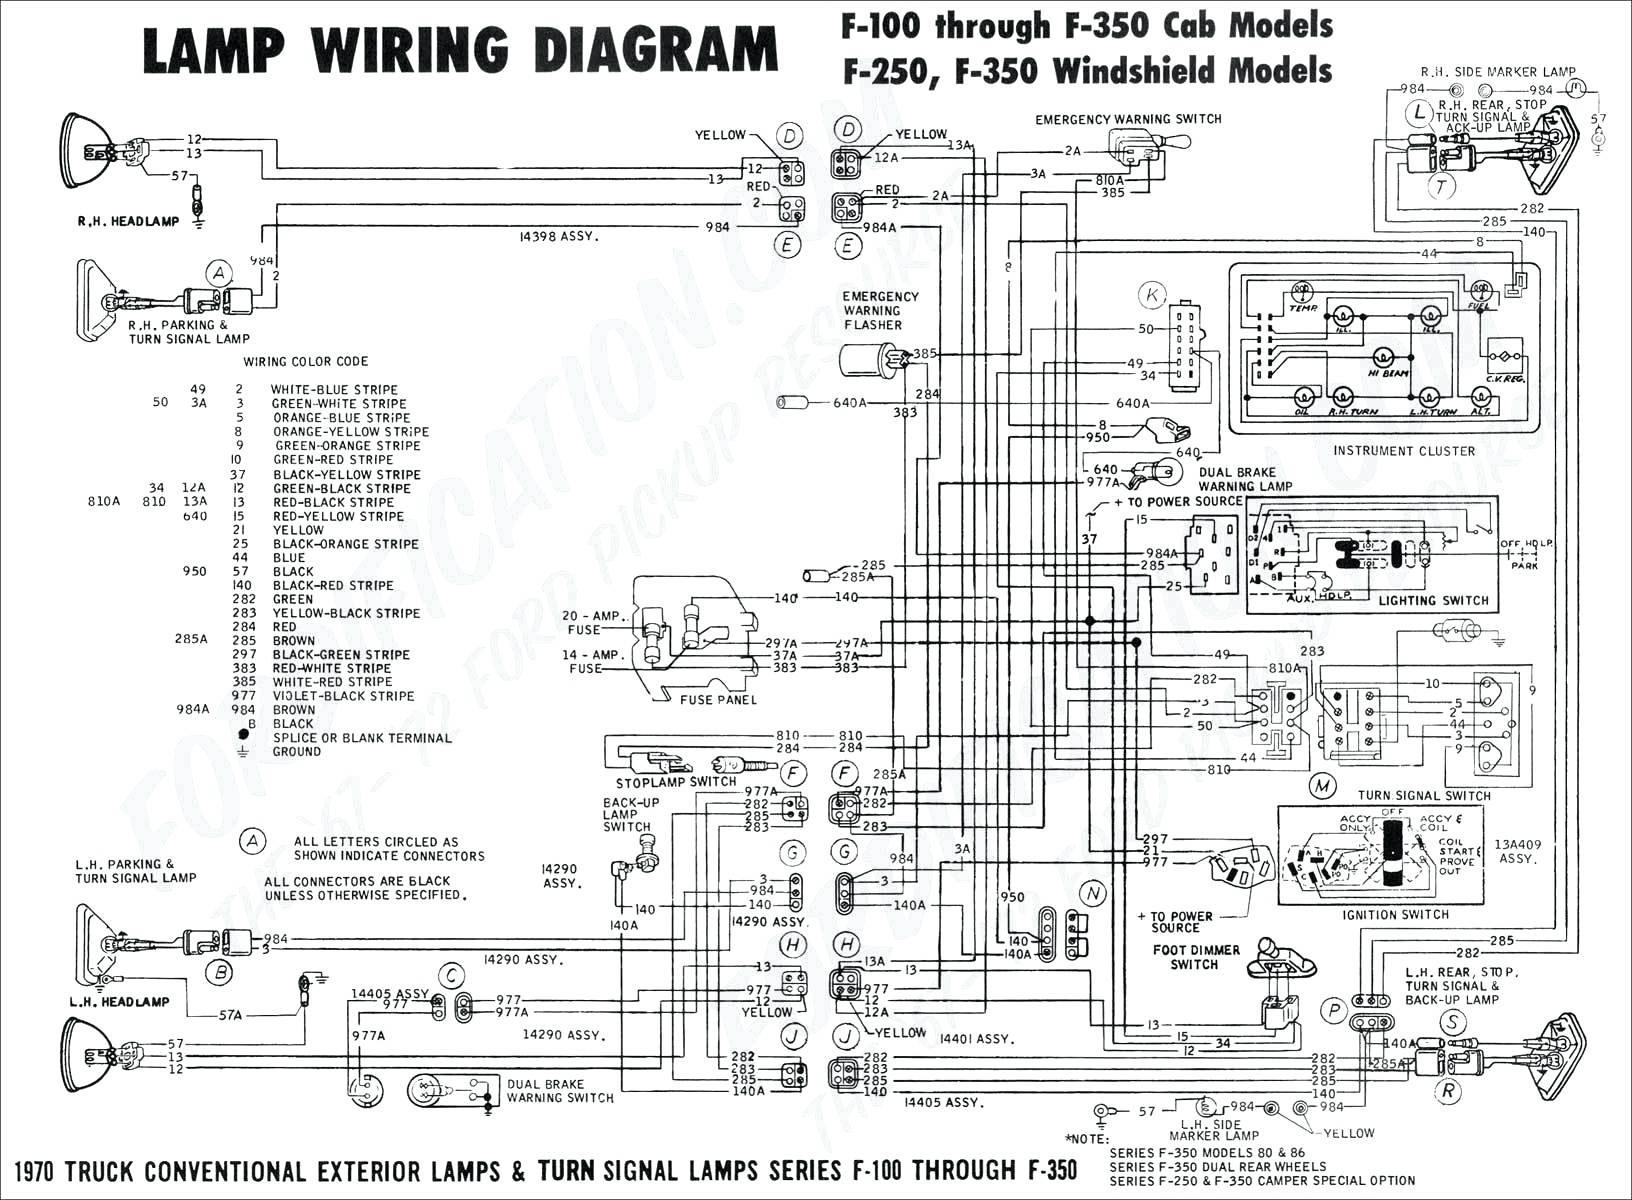 2006 F350 Wiring Diagram Ford Relay Electrical Diagrams Engine Enthusiast U2022 Toyota Corolla